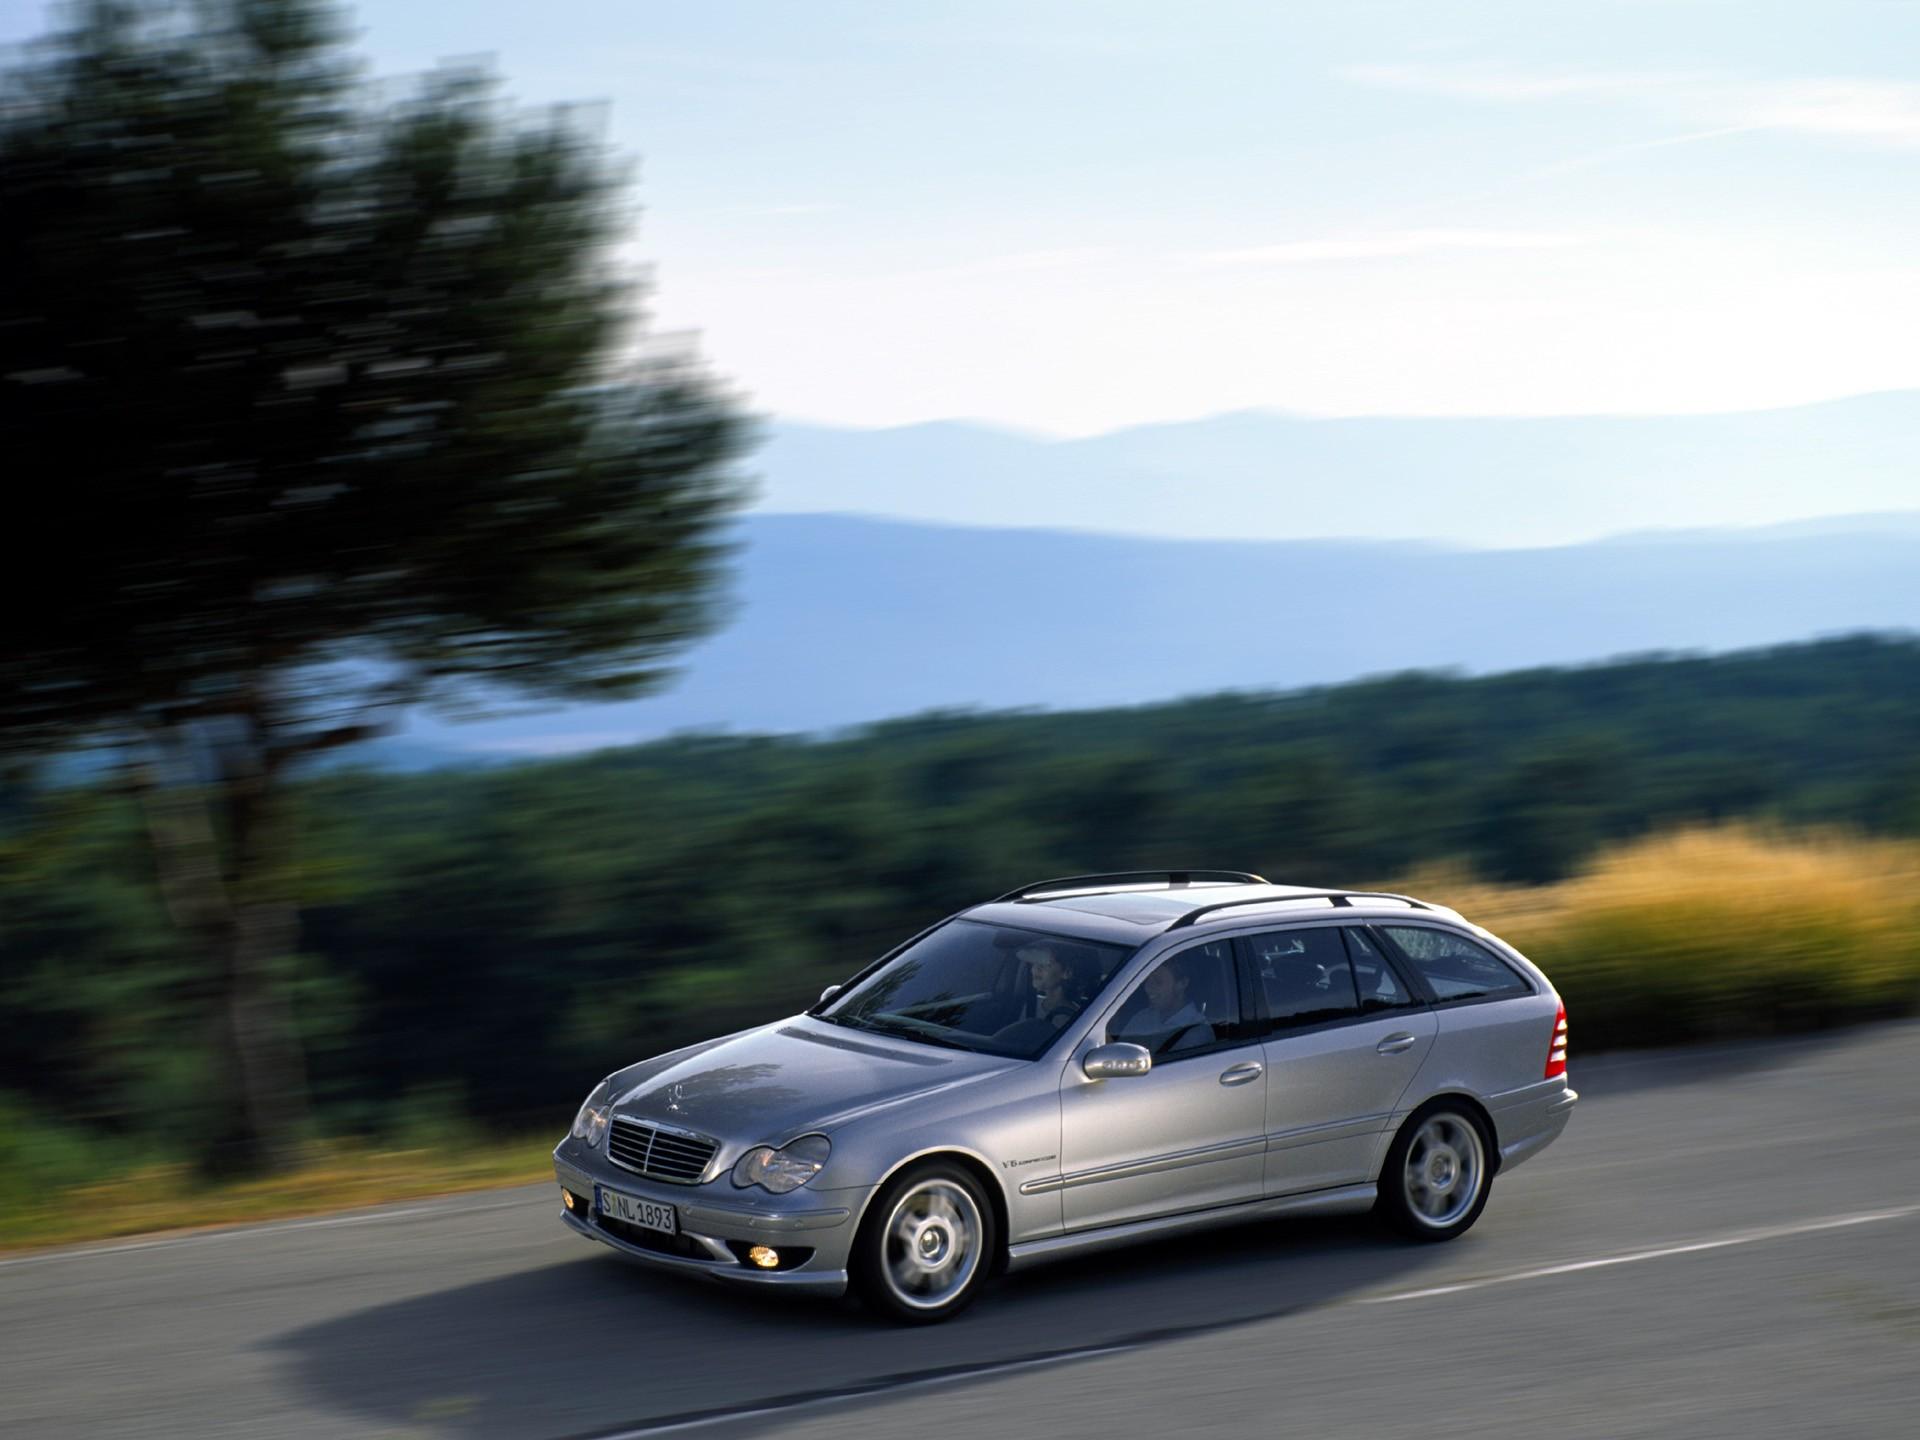 Mercedes Benz C Klasse T Modell Amg S203 Specs Photos 2001